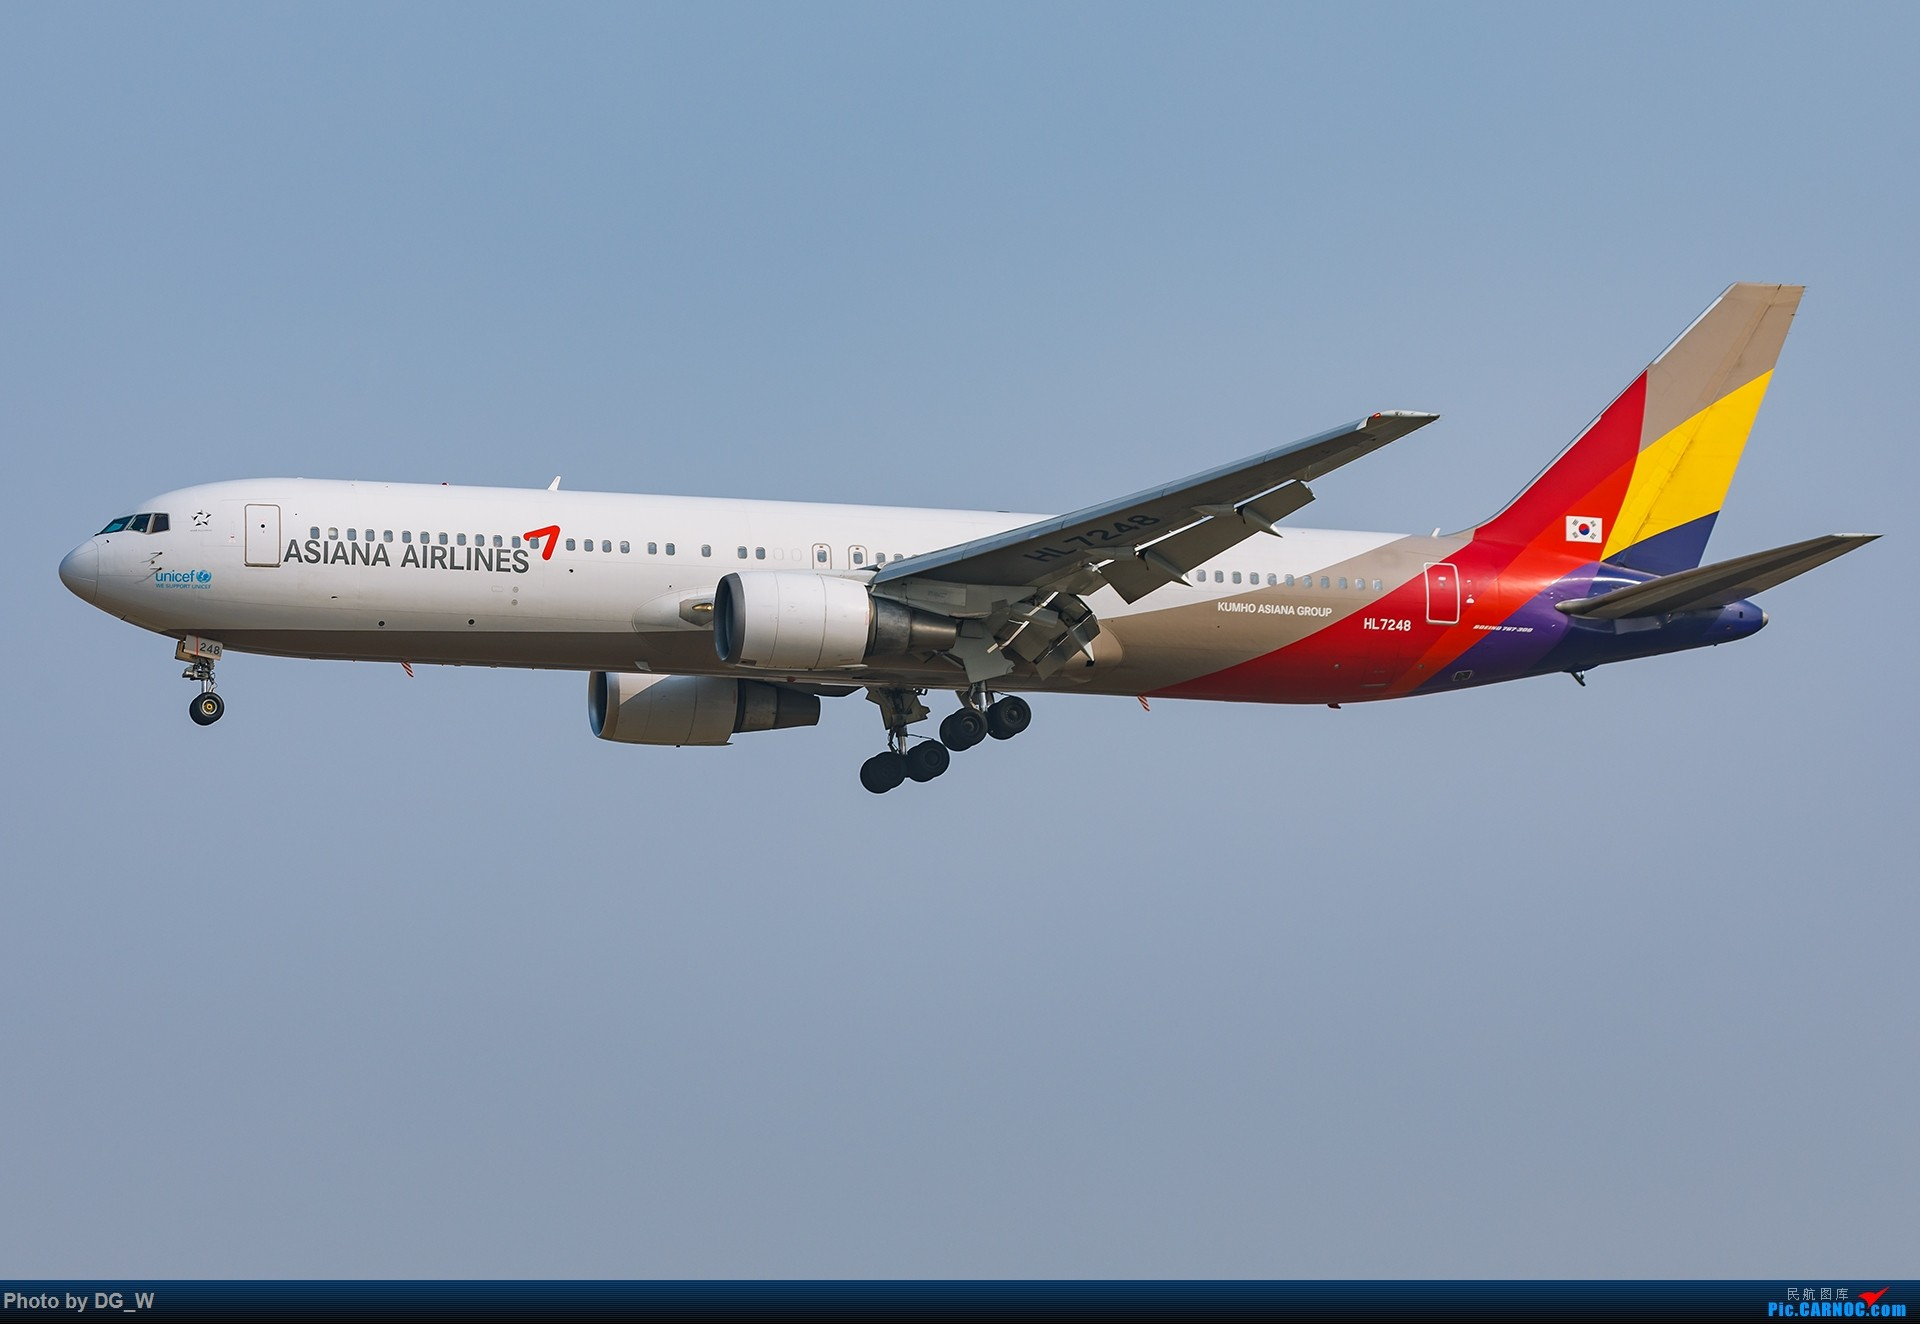 Re:[原创]【南宁飞友】一张8元机票带来的帝都之旅 BOEING 767-300ER HL7248 中国北京首都国际机场